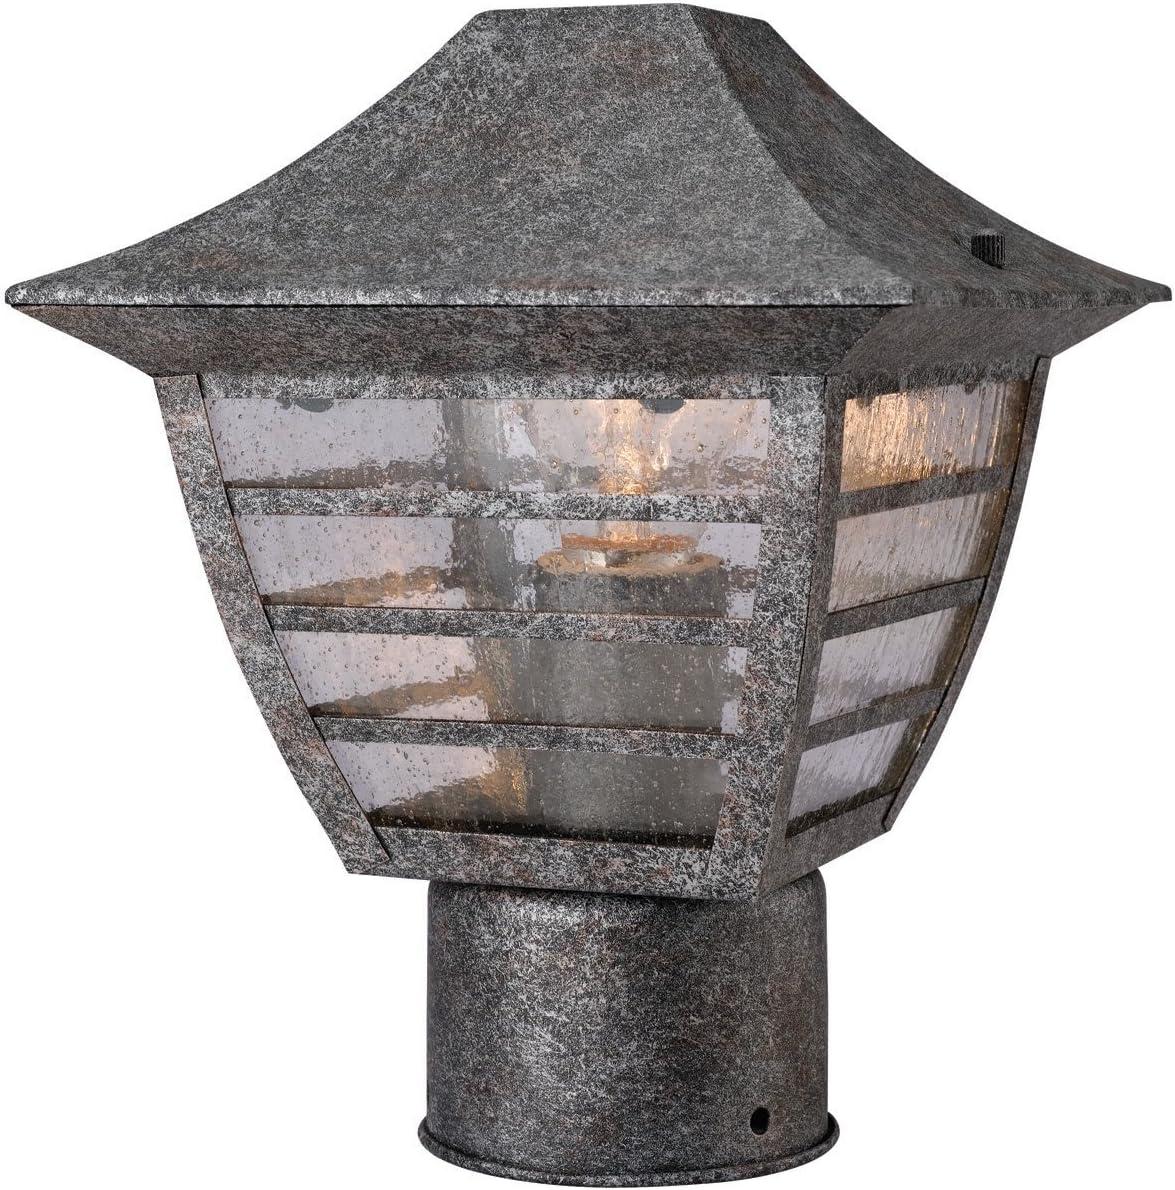 Hardware House H10-3947 Dakota Outdoor Fixture Post Light, Antique Silver